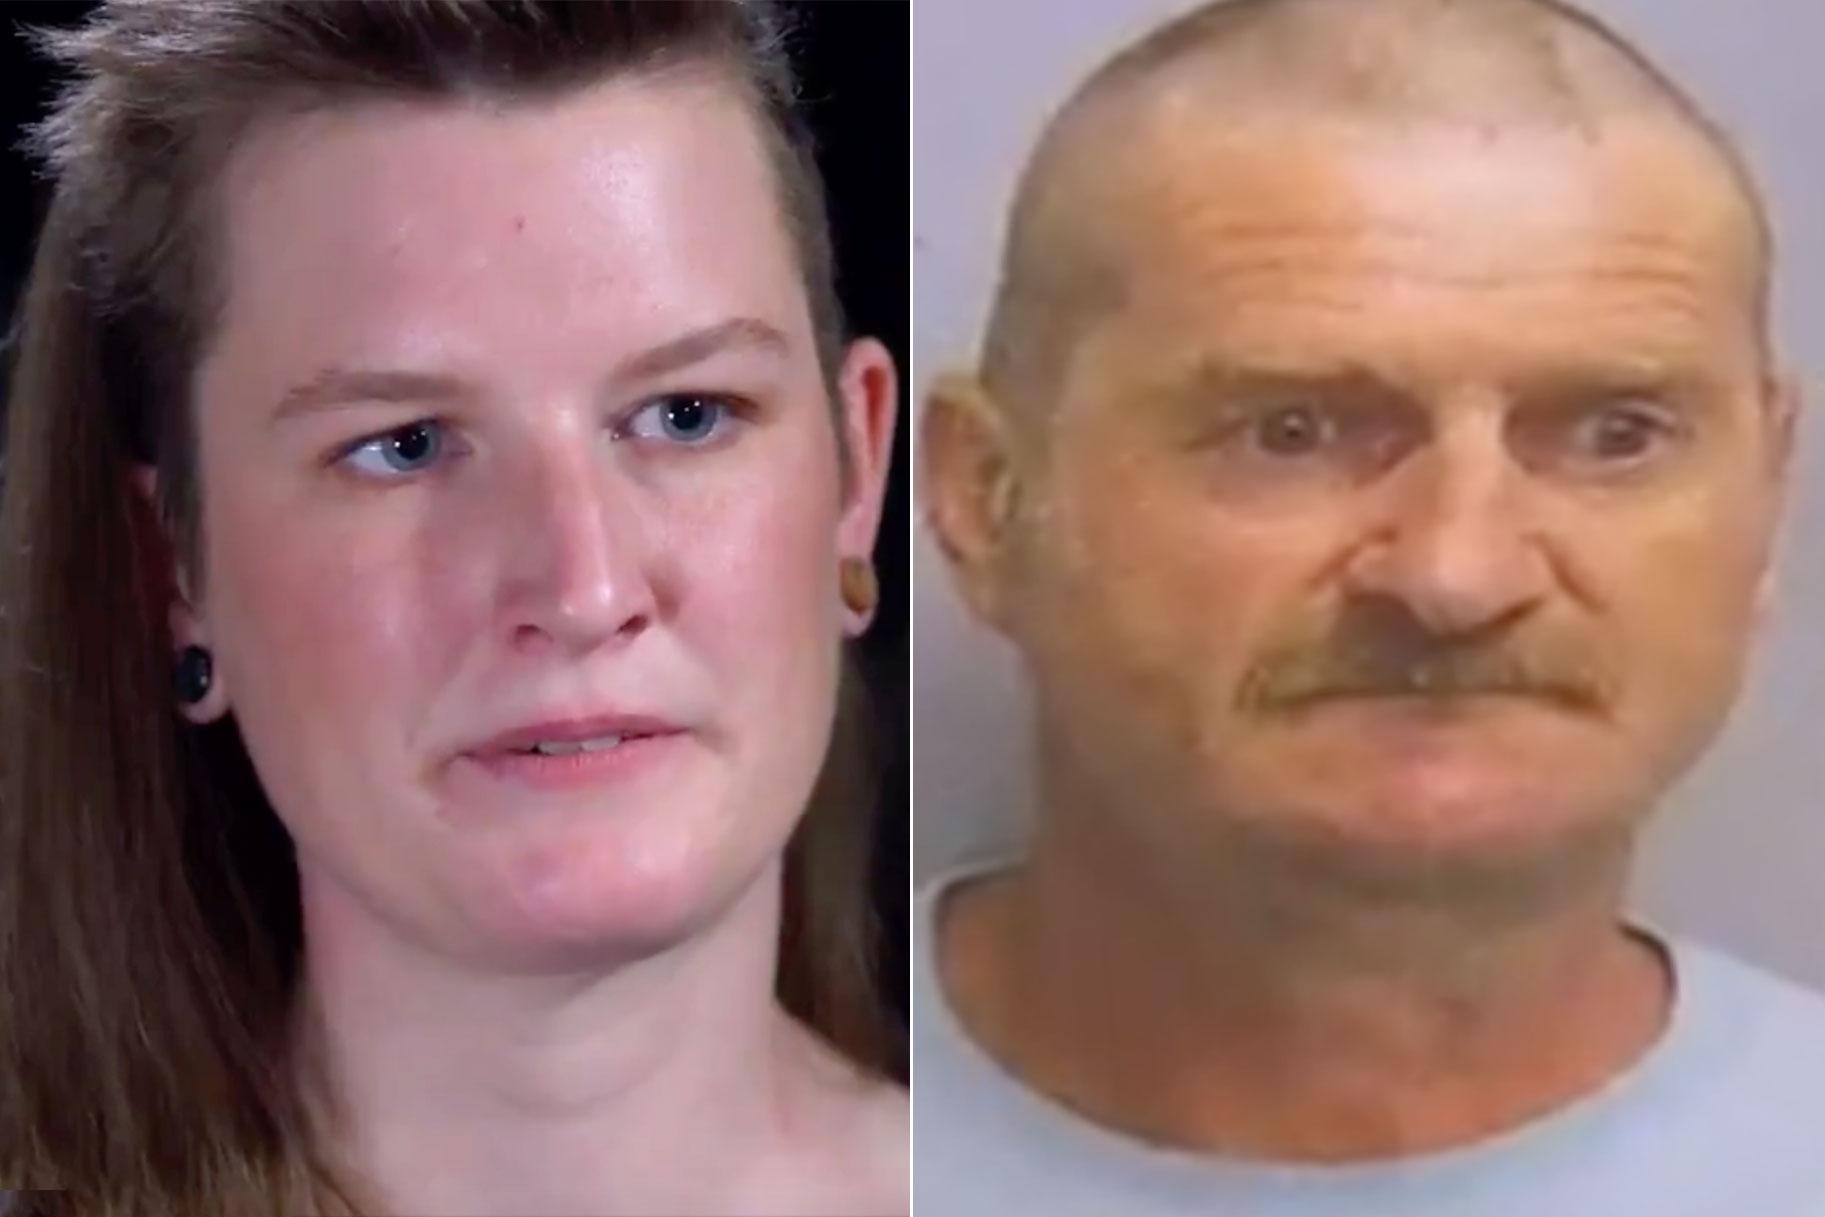 3 Get Death For Beheading Maren Ueland, Louisa Vesterager